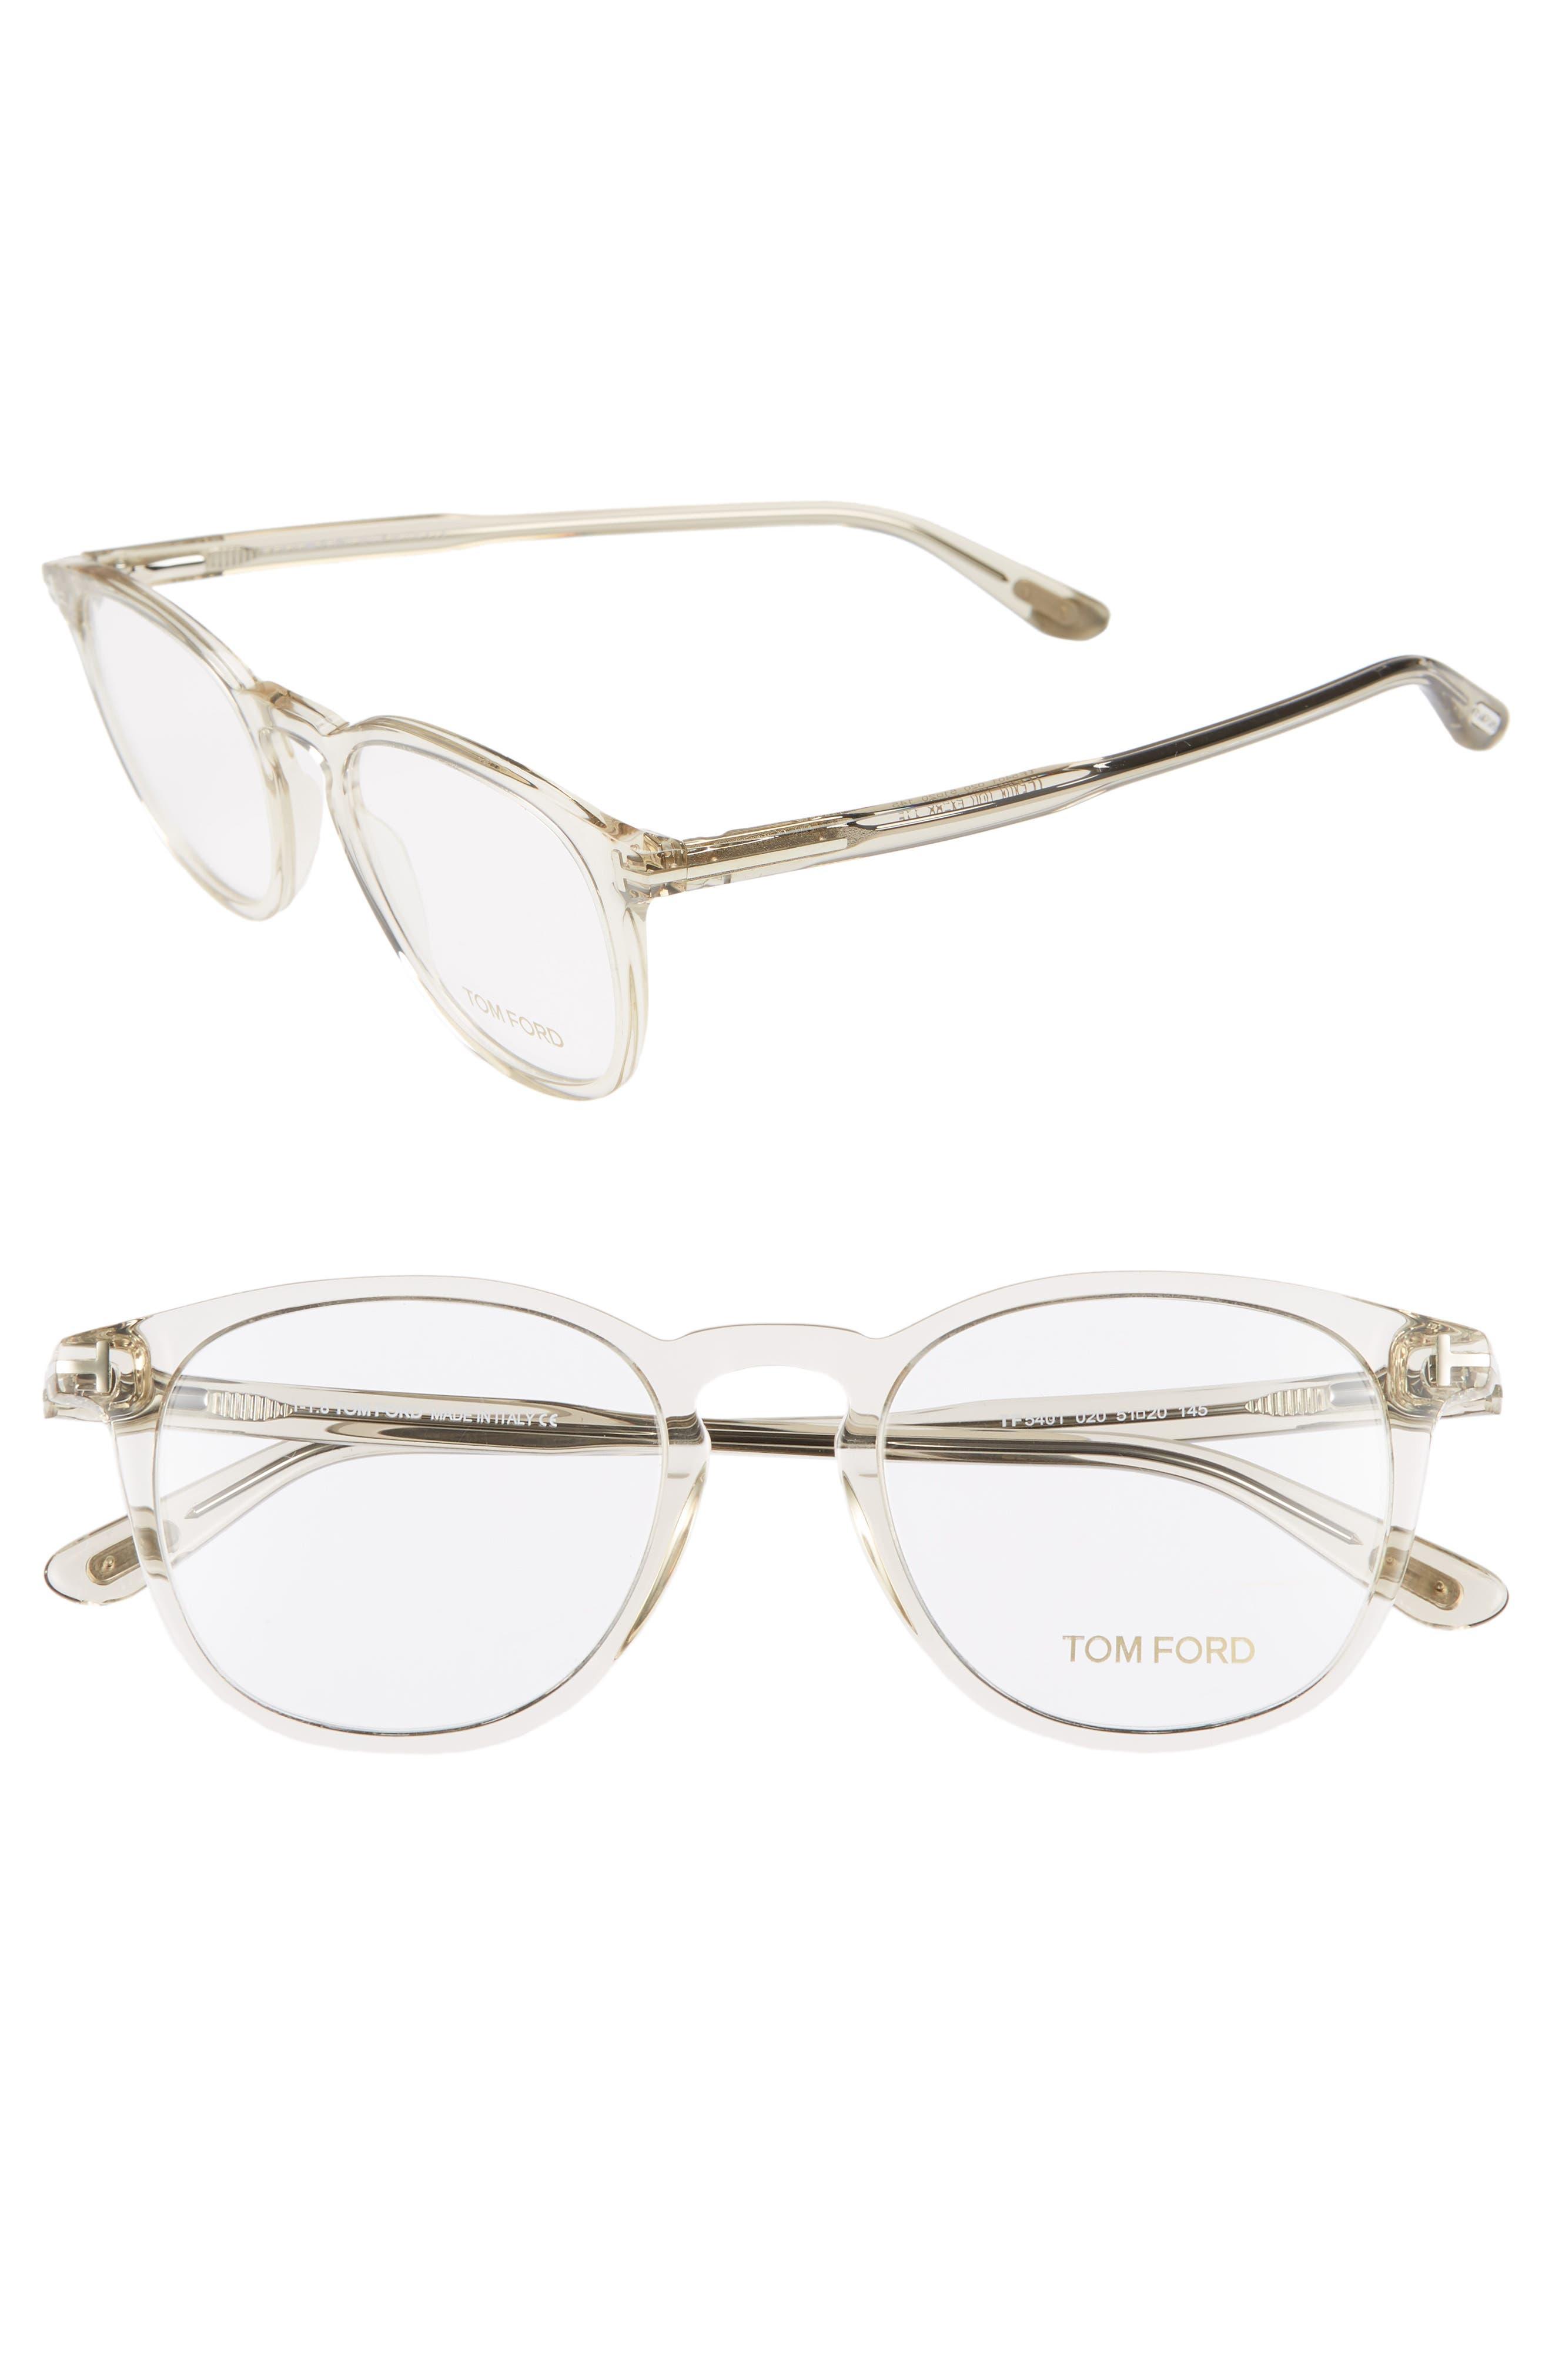 51mm Round Optical Glasses,                             Main thumbnail 1, color,                             SHINY TRANSPARENT GREY